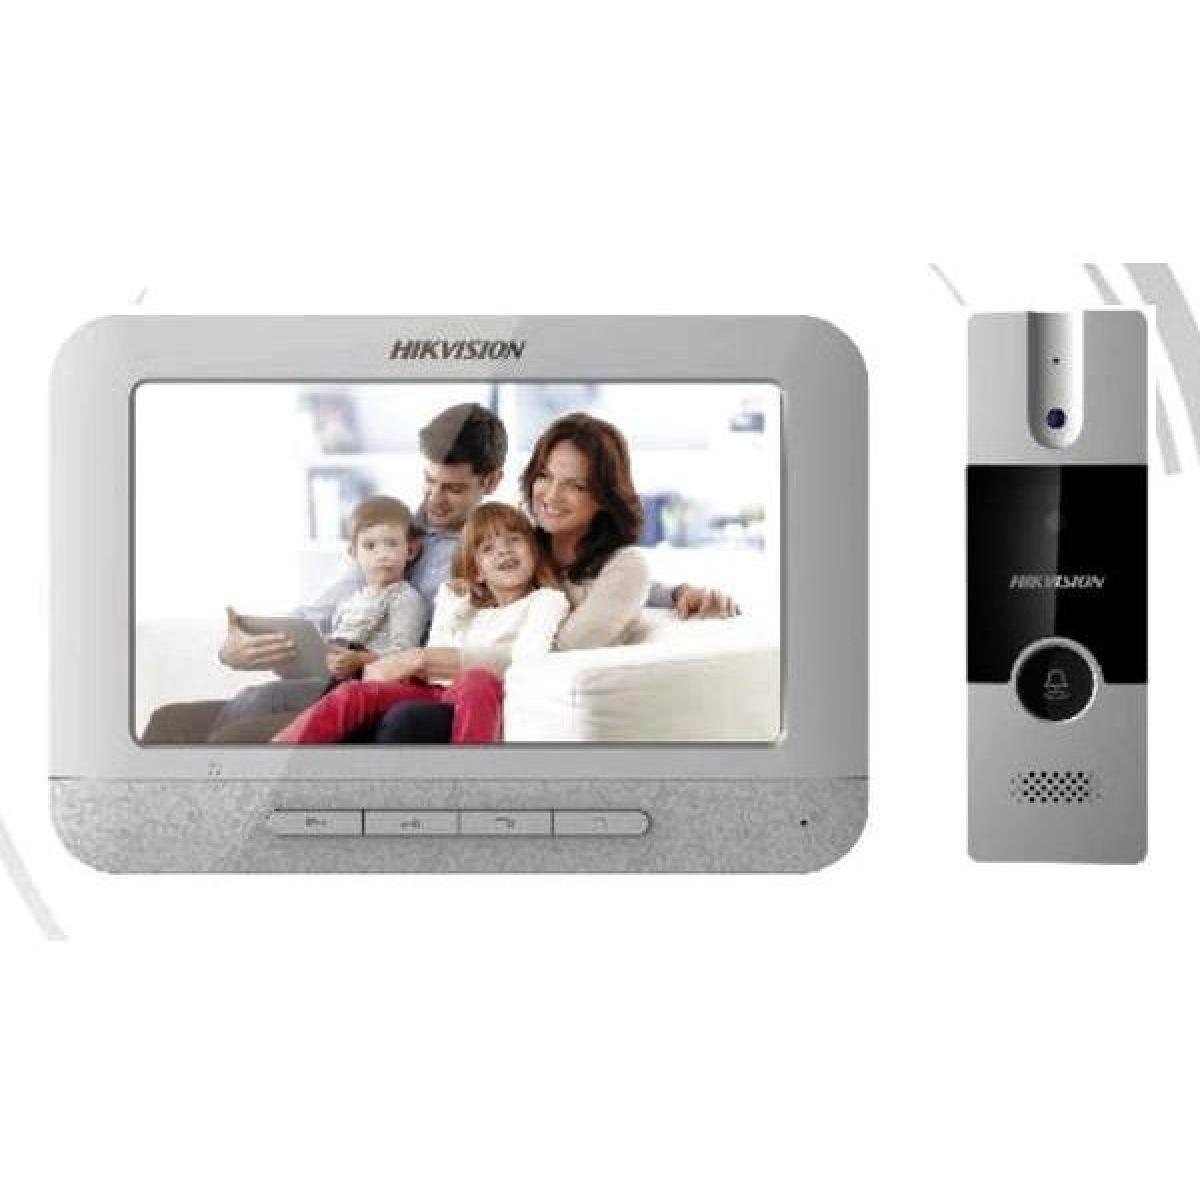 Hikvision Ds Kis201 Analog Video Intercom System Ds